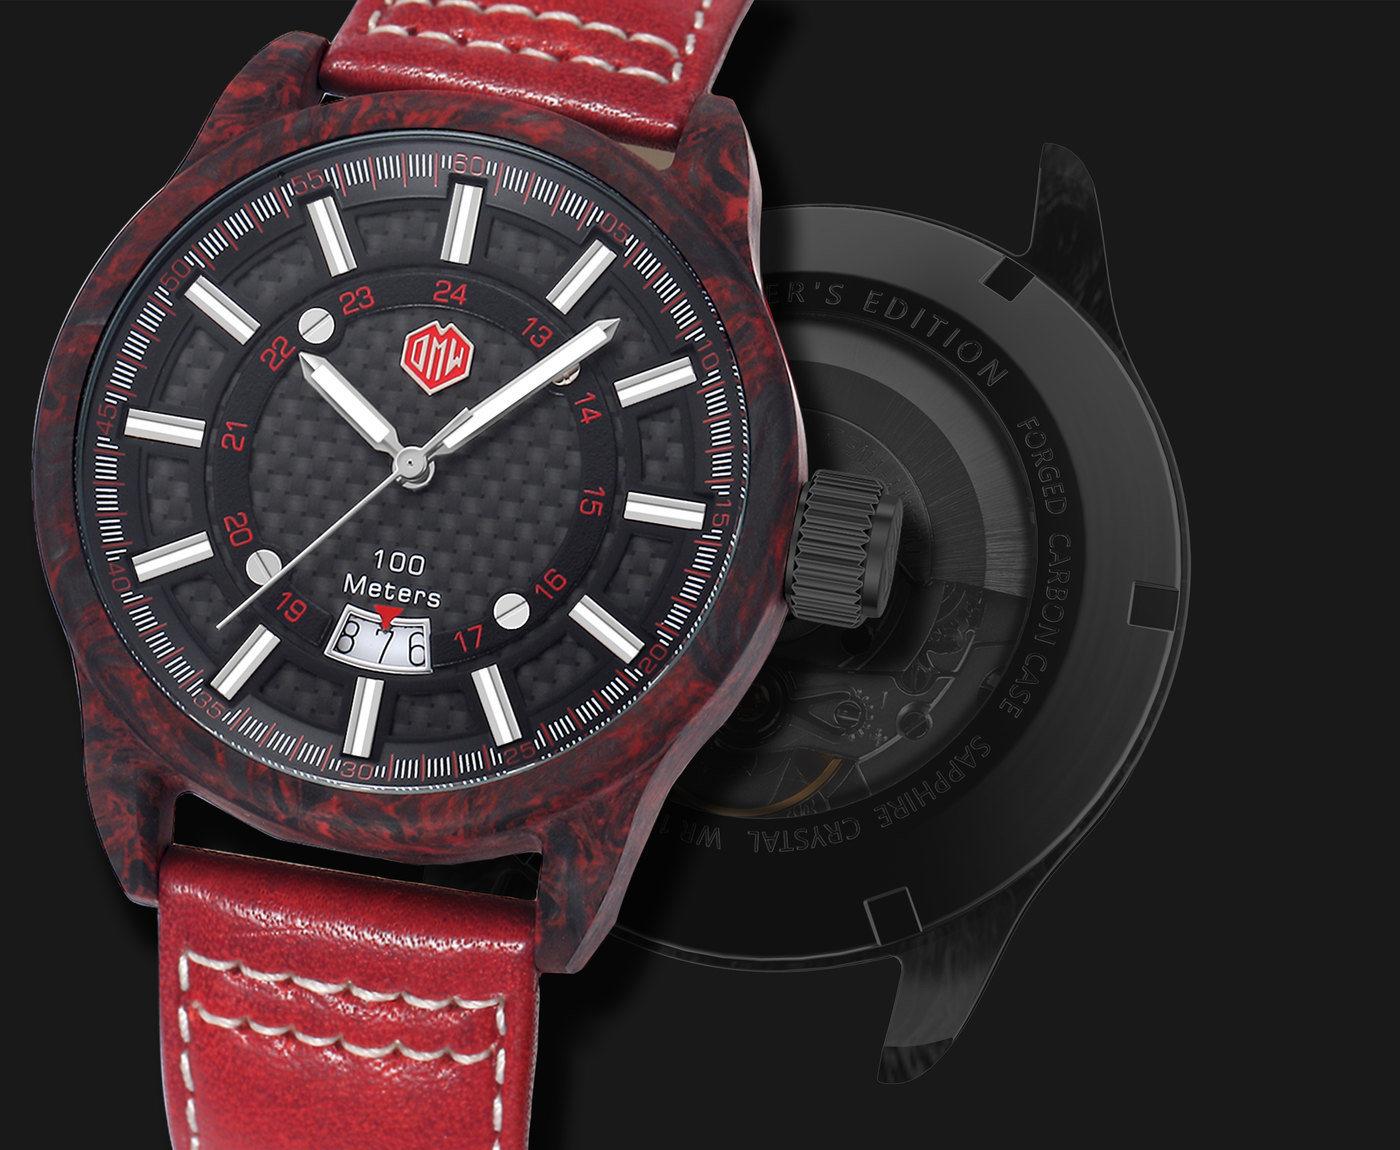 OMW Elementor Sports Car Watches